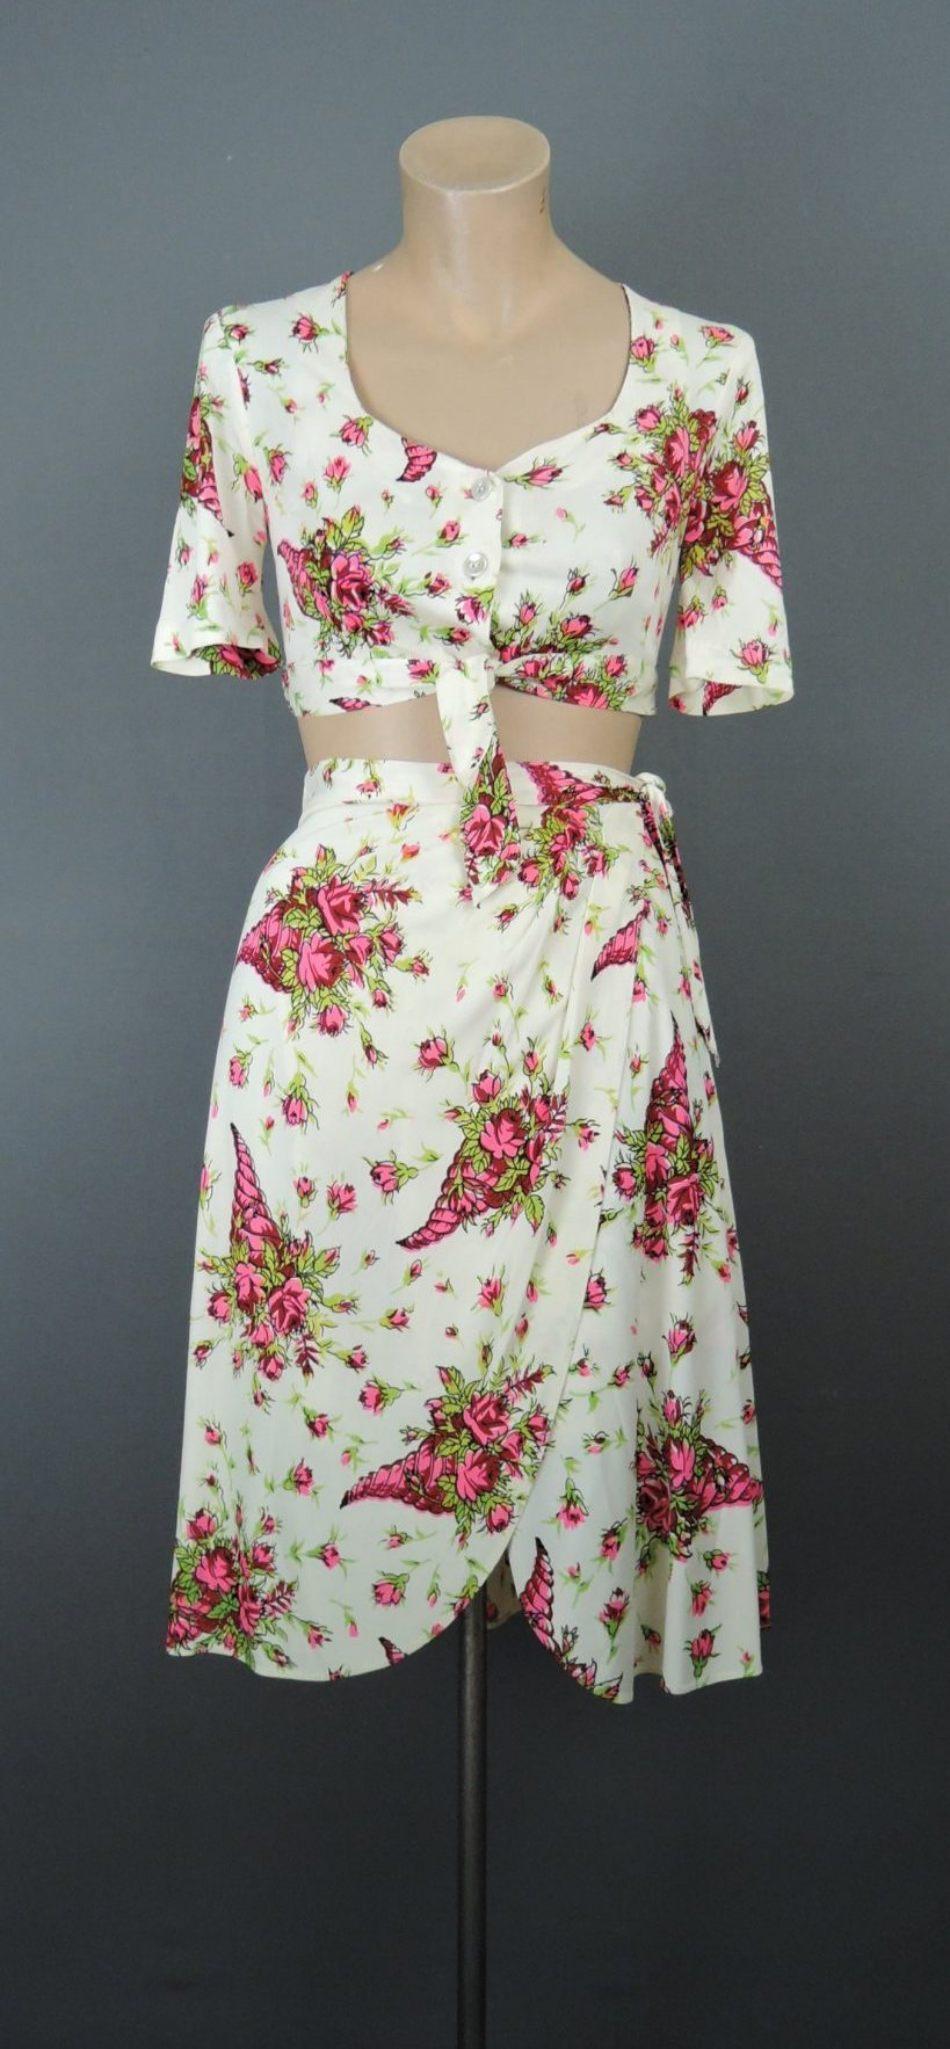 Vintage 1940s Rayon Jersey Top, Skirt & Shorts Set, Floral, 32 bust, Beau Jardin Cie